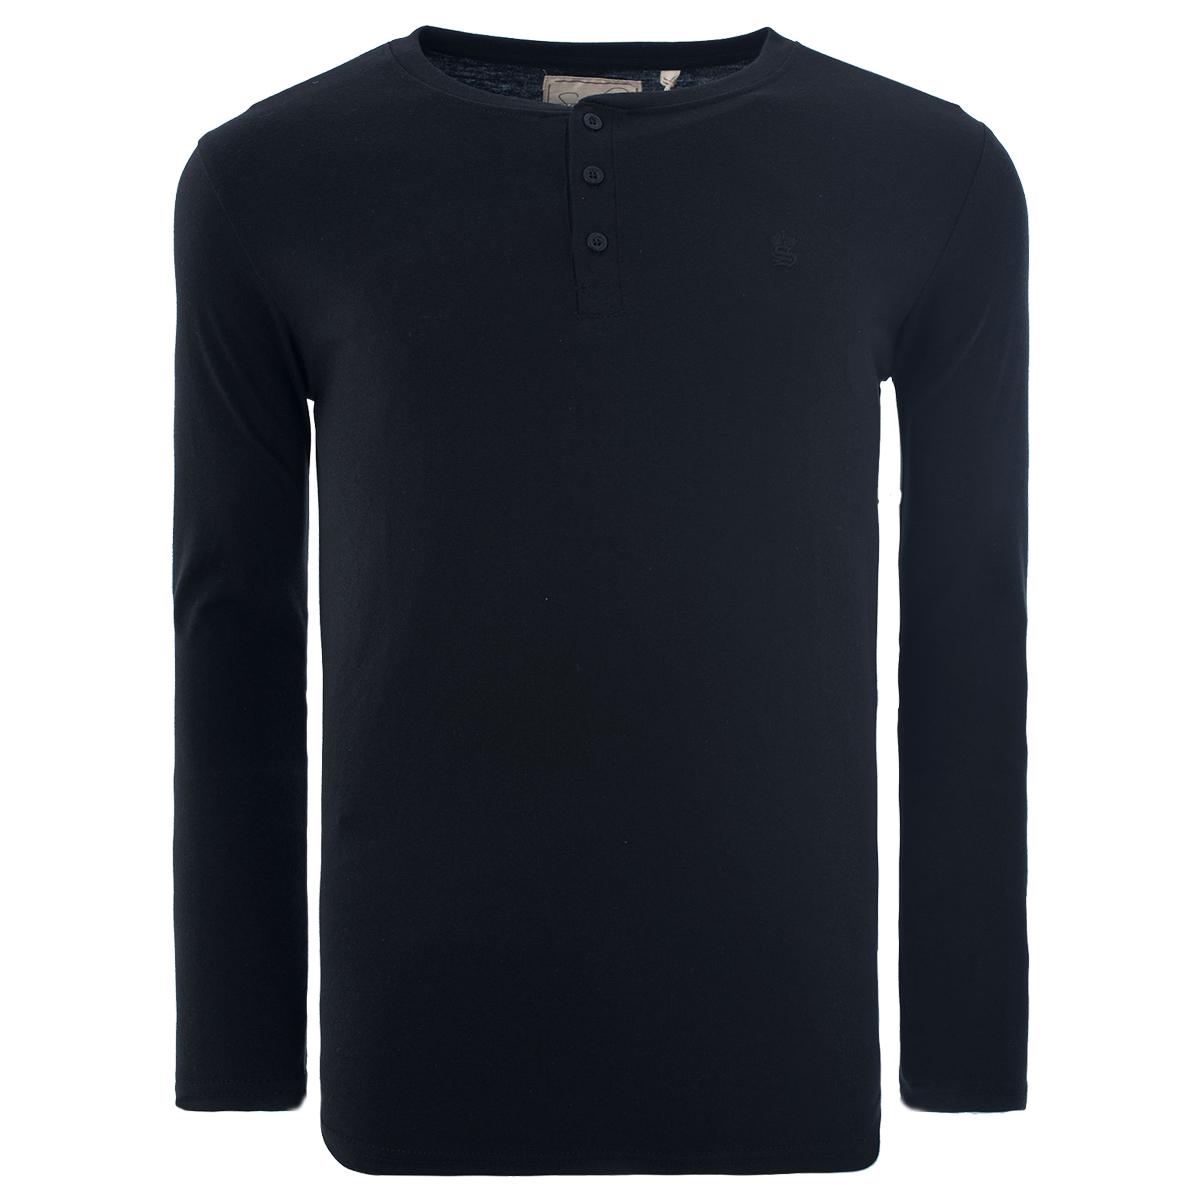 Men-Grandad-T-Shirt-Long-Sleeve-Jersey-Ribbed-Top-Cotton-Rich-Brave-Soul thumbnail 44